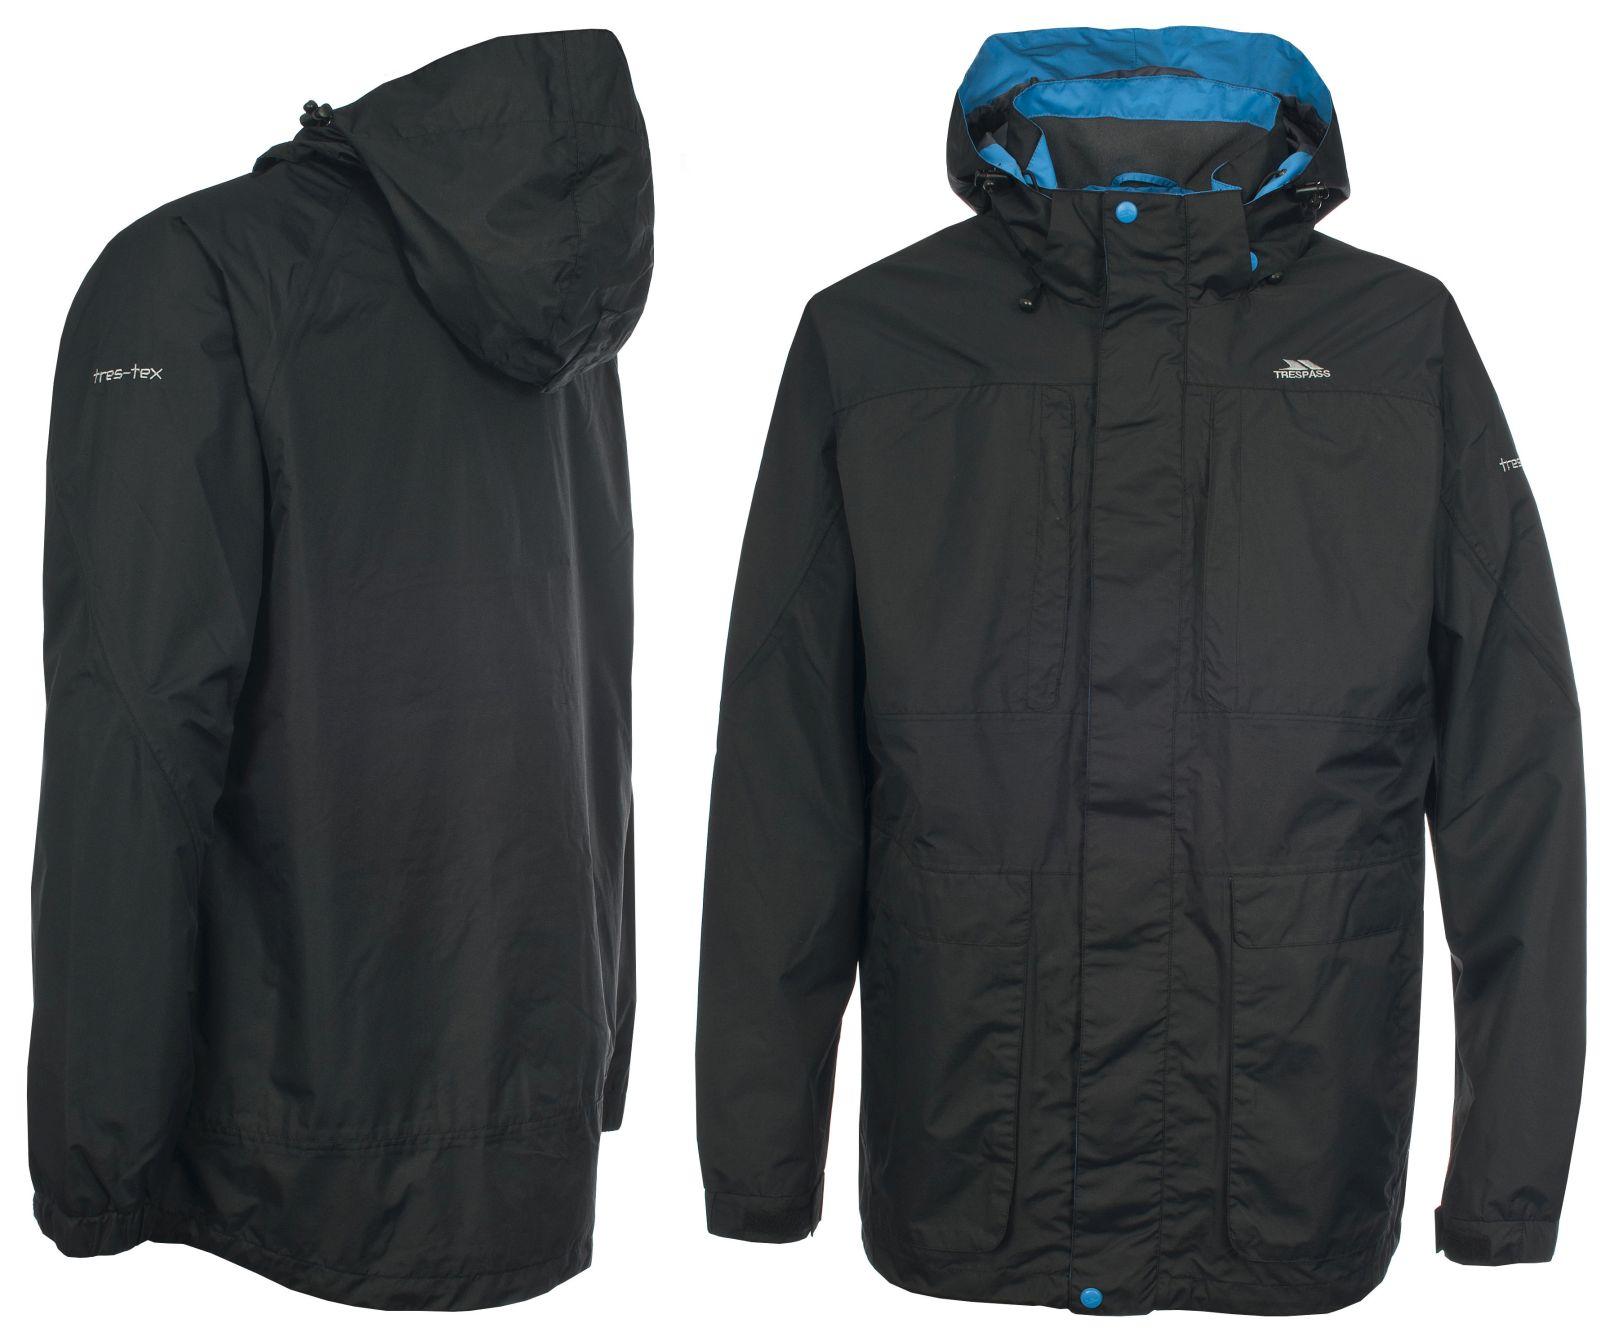 Mens Teens Trespass Waterproof Breathable Rain Jacket Coat